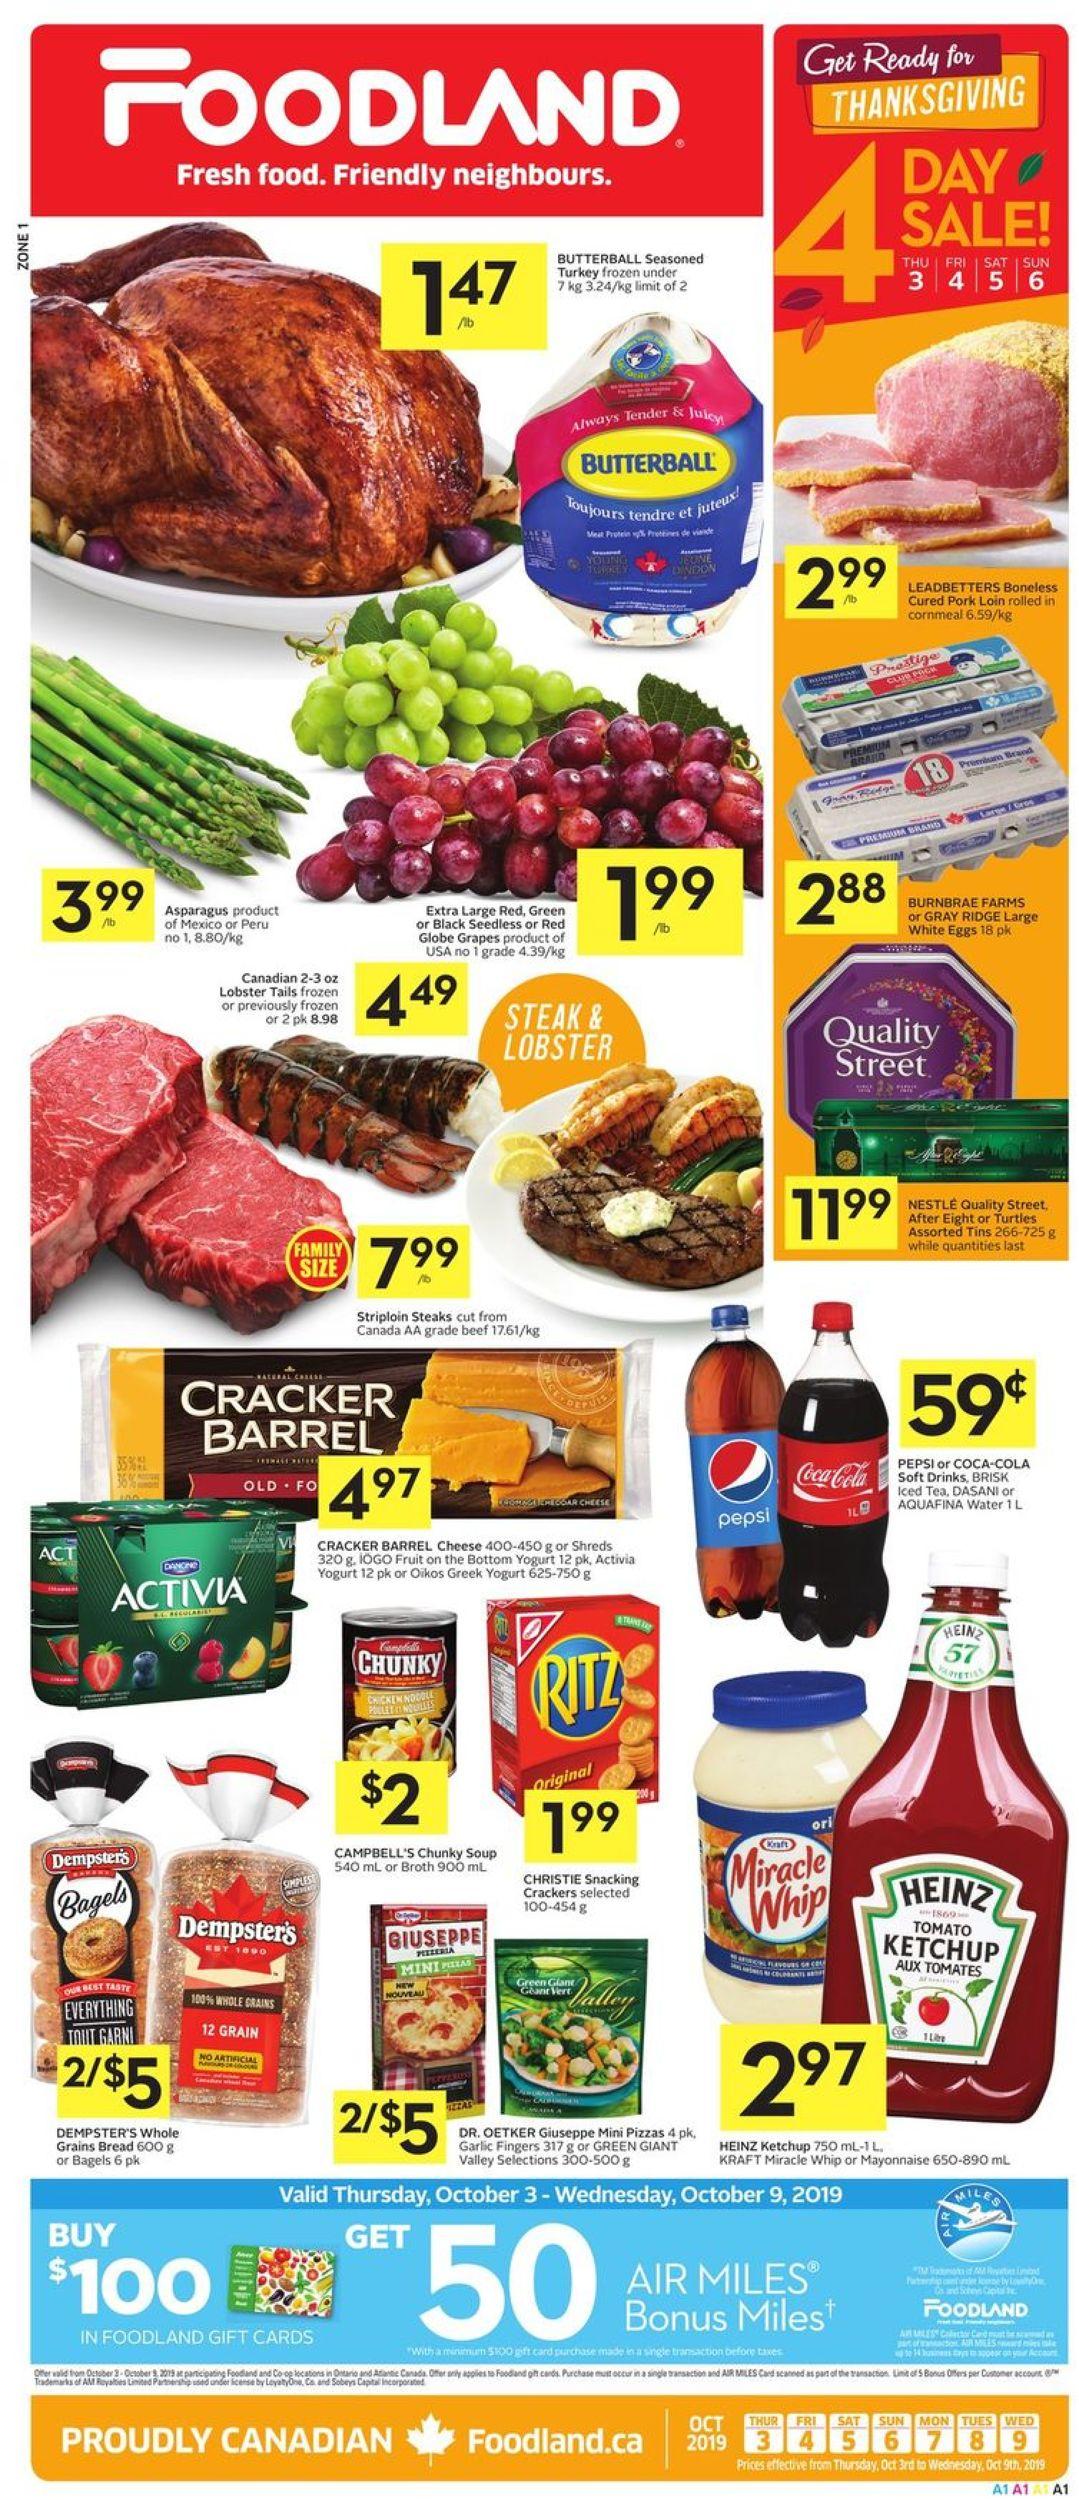 Foodland Flyer - 10/03-10/09/2019